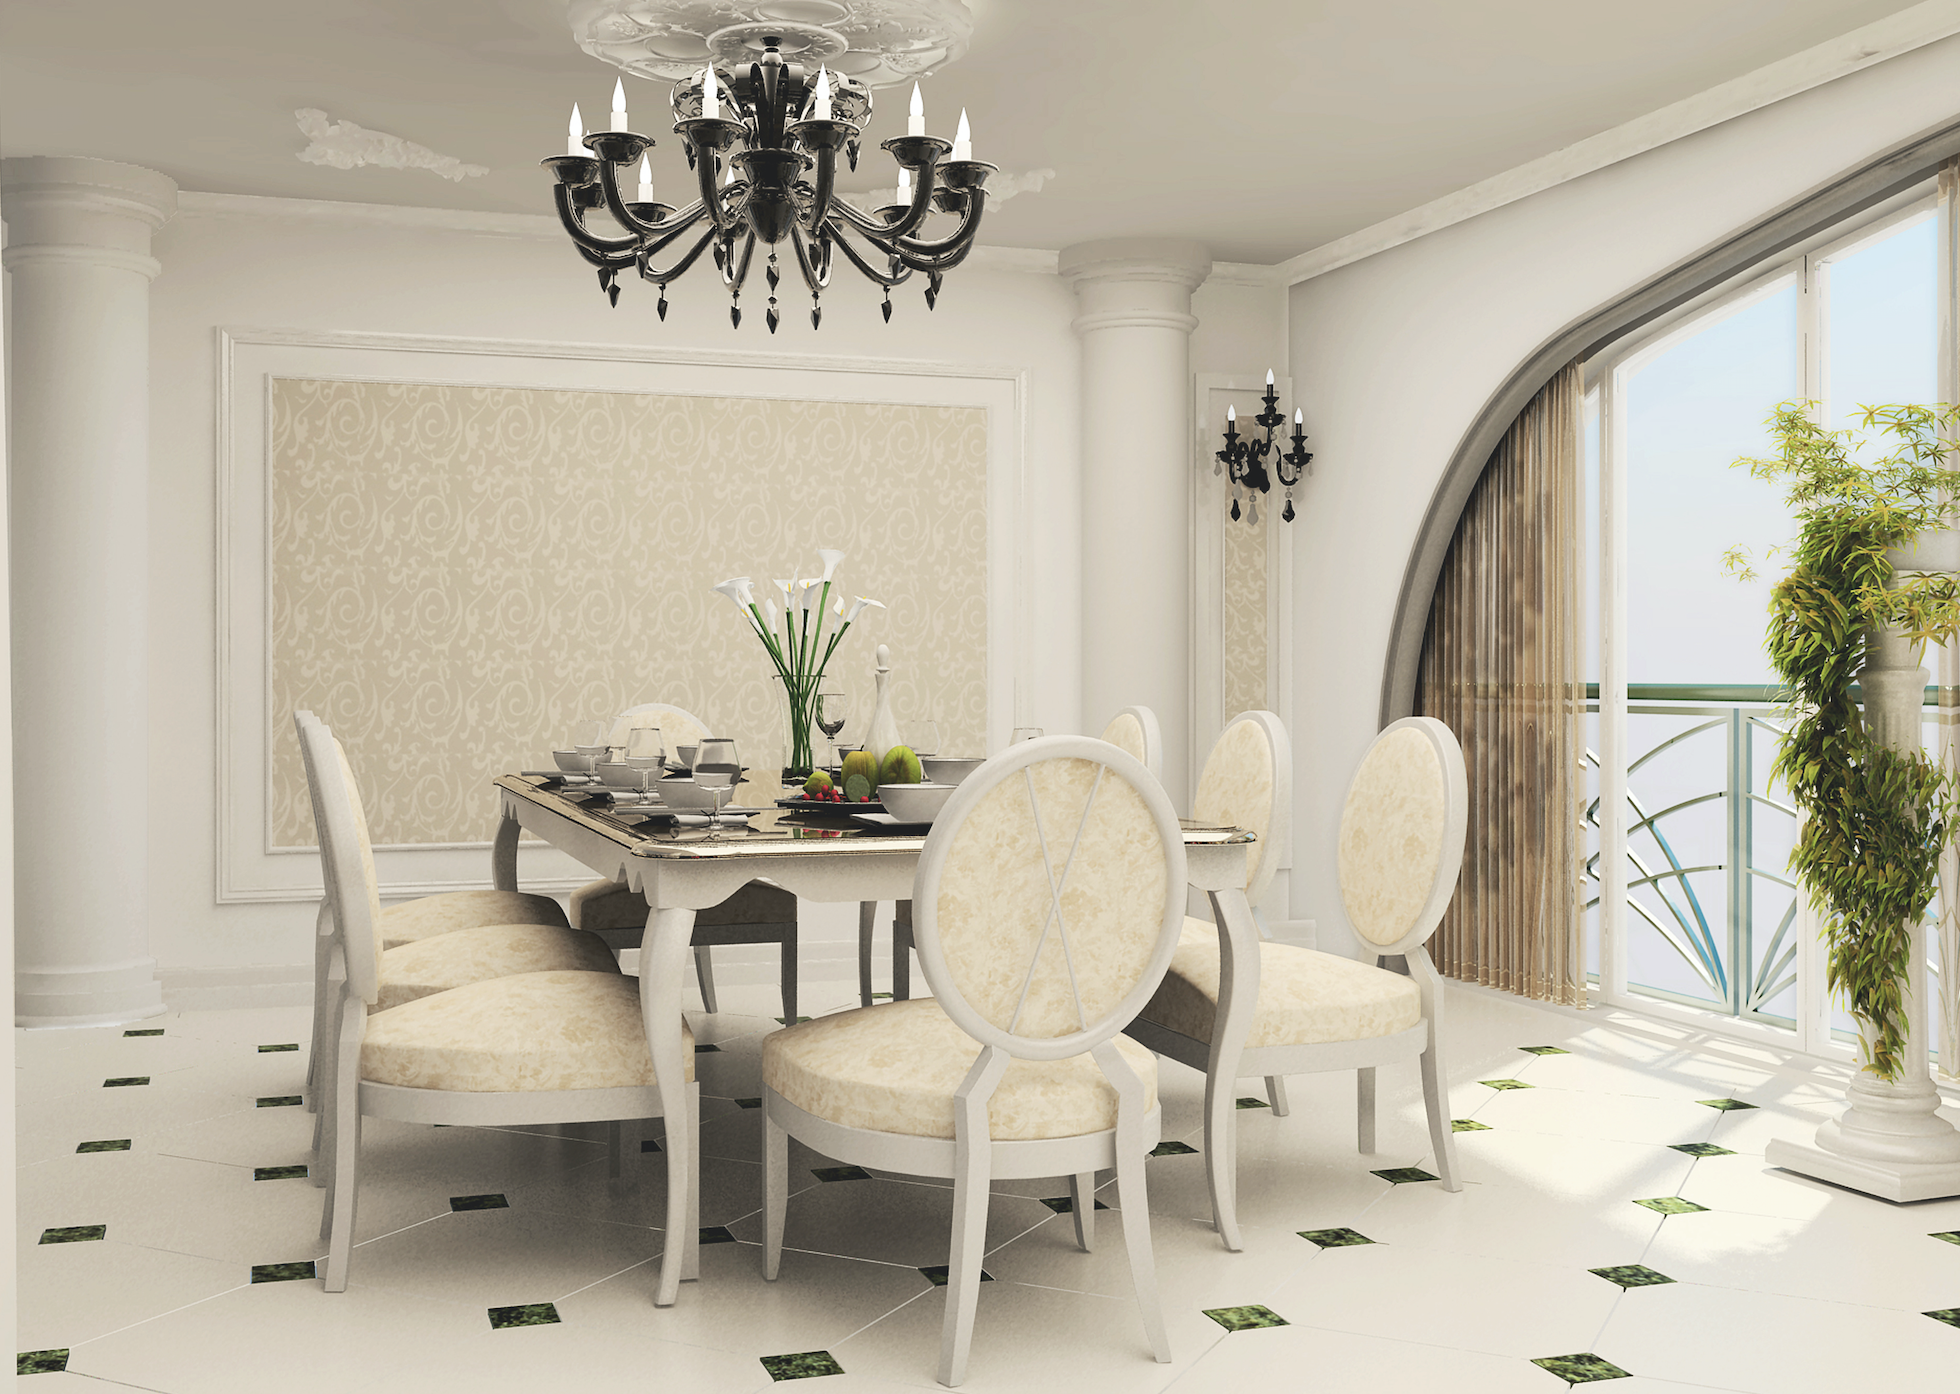 Karla Chacon  interior design lucury decoration karla chacon Karla Chacon: Glamorous Modern Interior Design Ideas 1